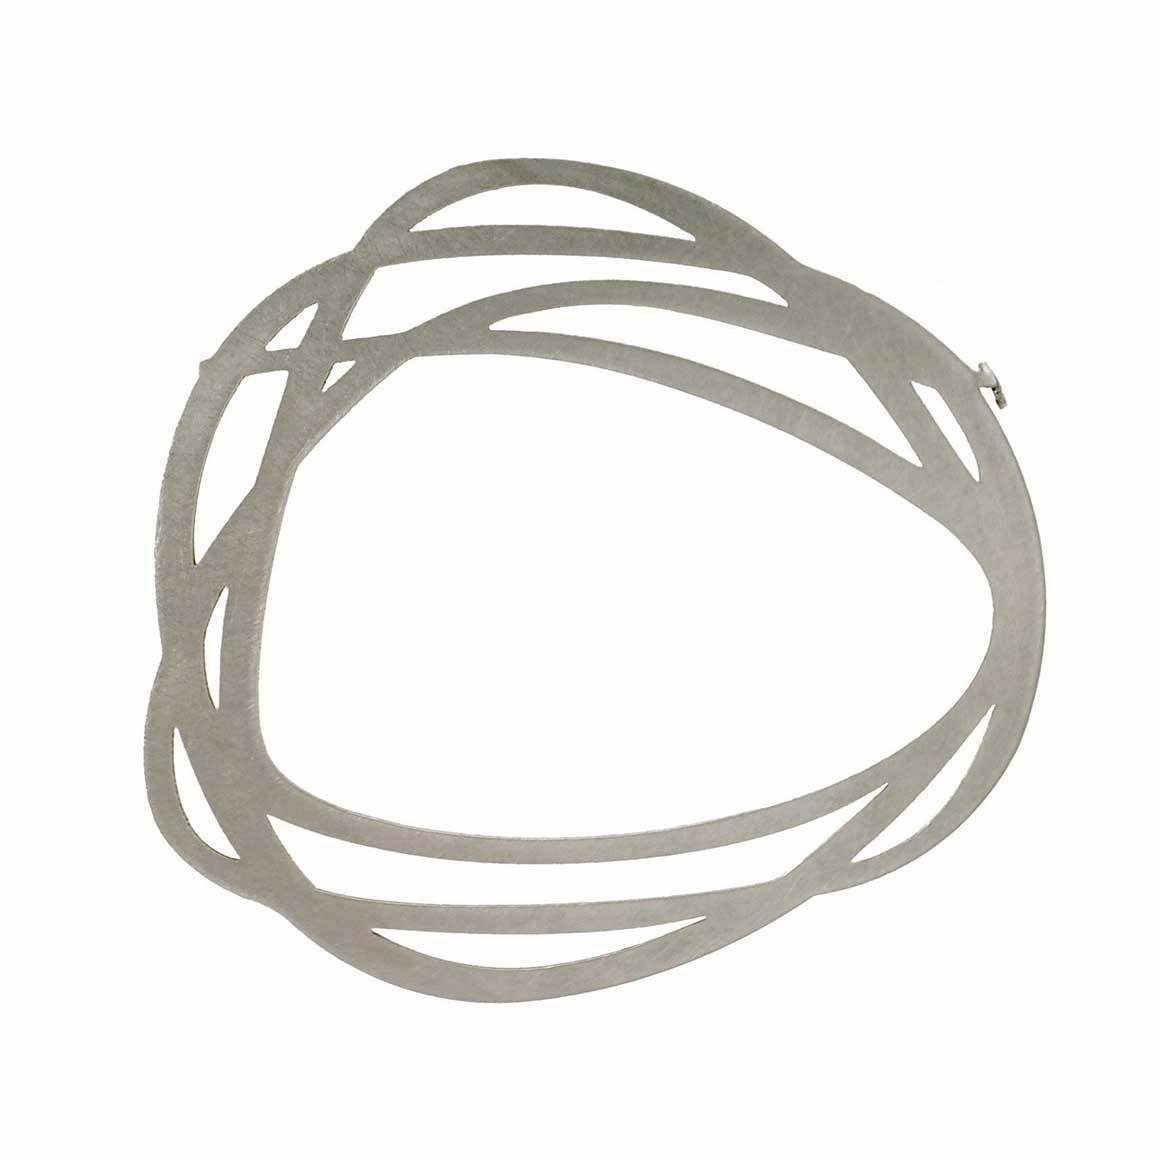 Brooch-Rings-Raw | Trada Marketplace